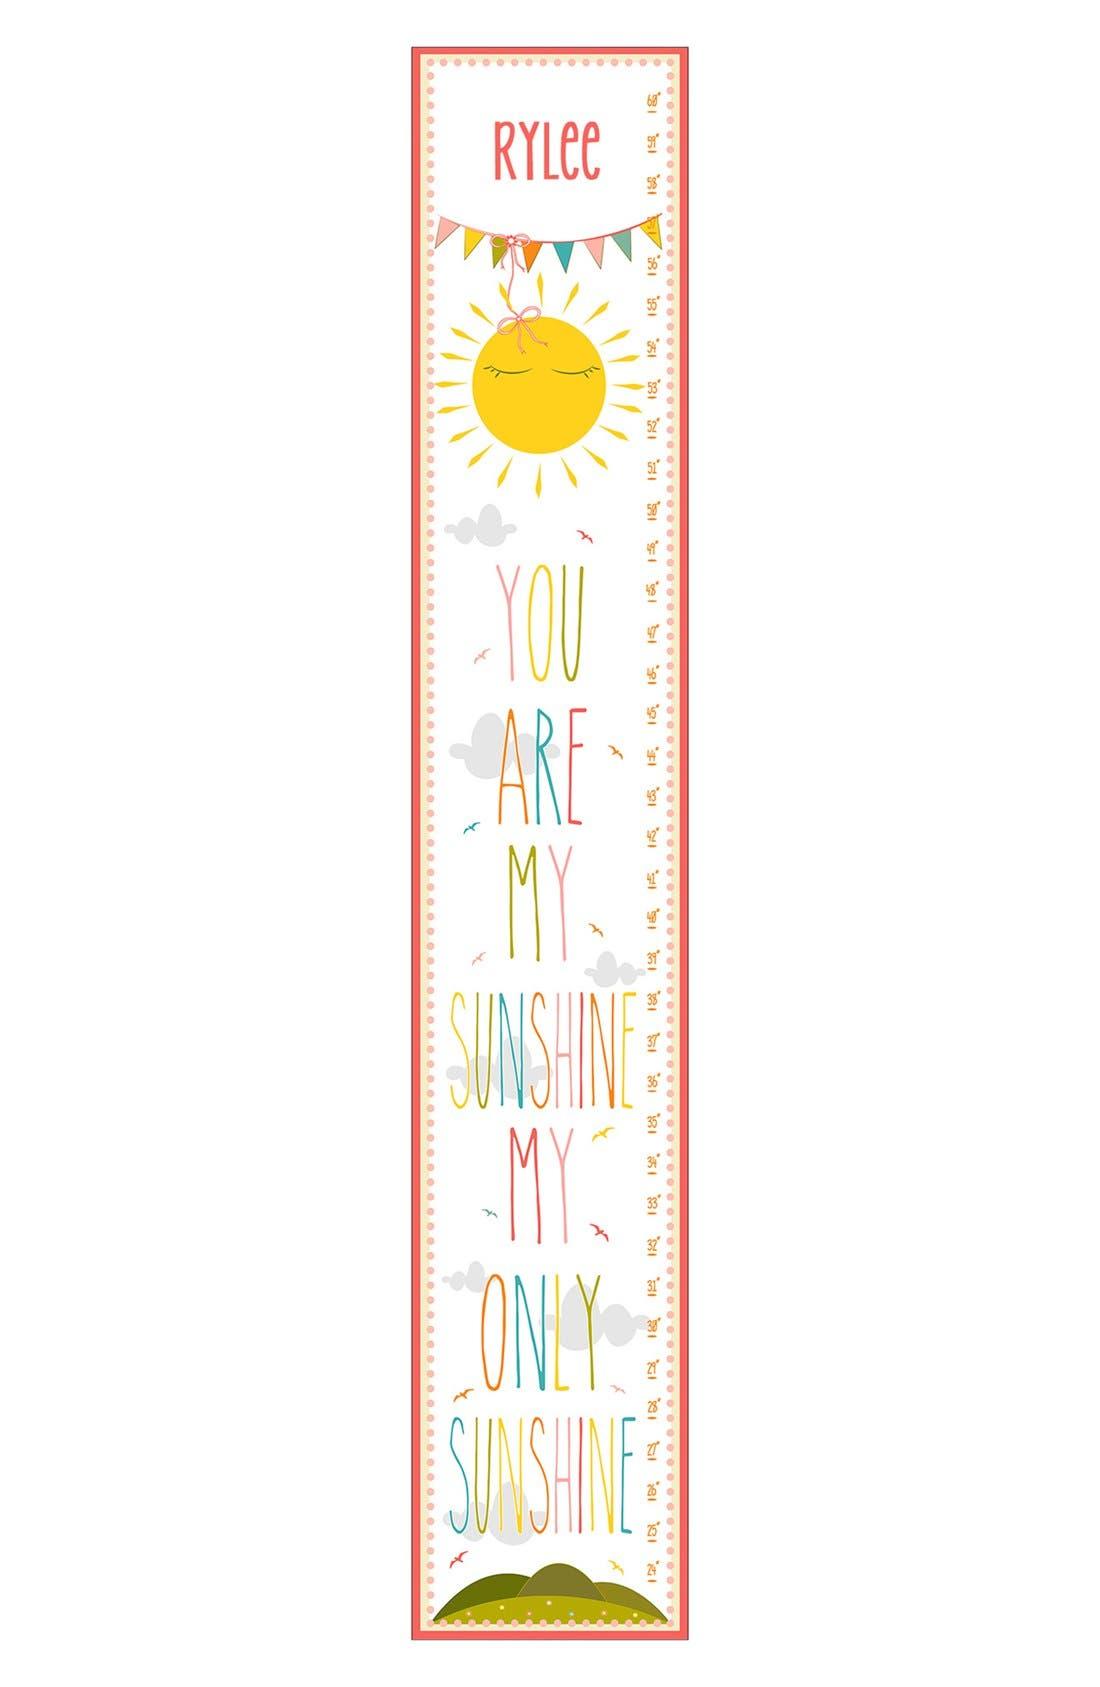 Alternate Image 1 Selected - Stupell 'Sunshine' Personalized Growth Chart